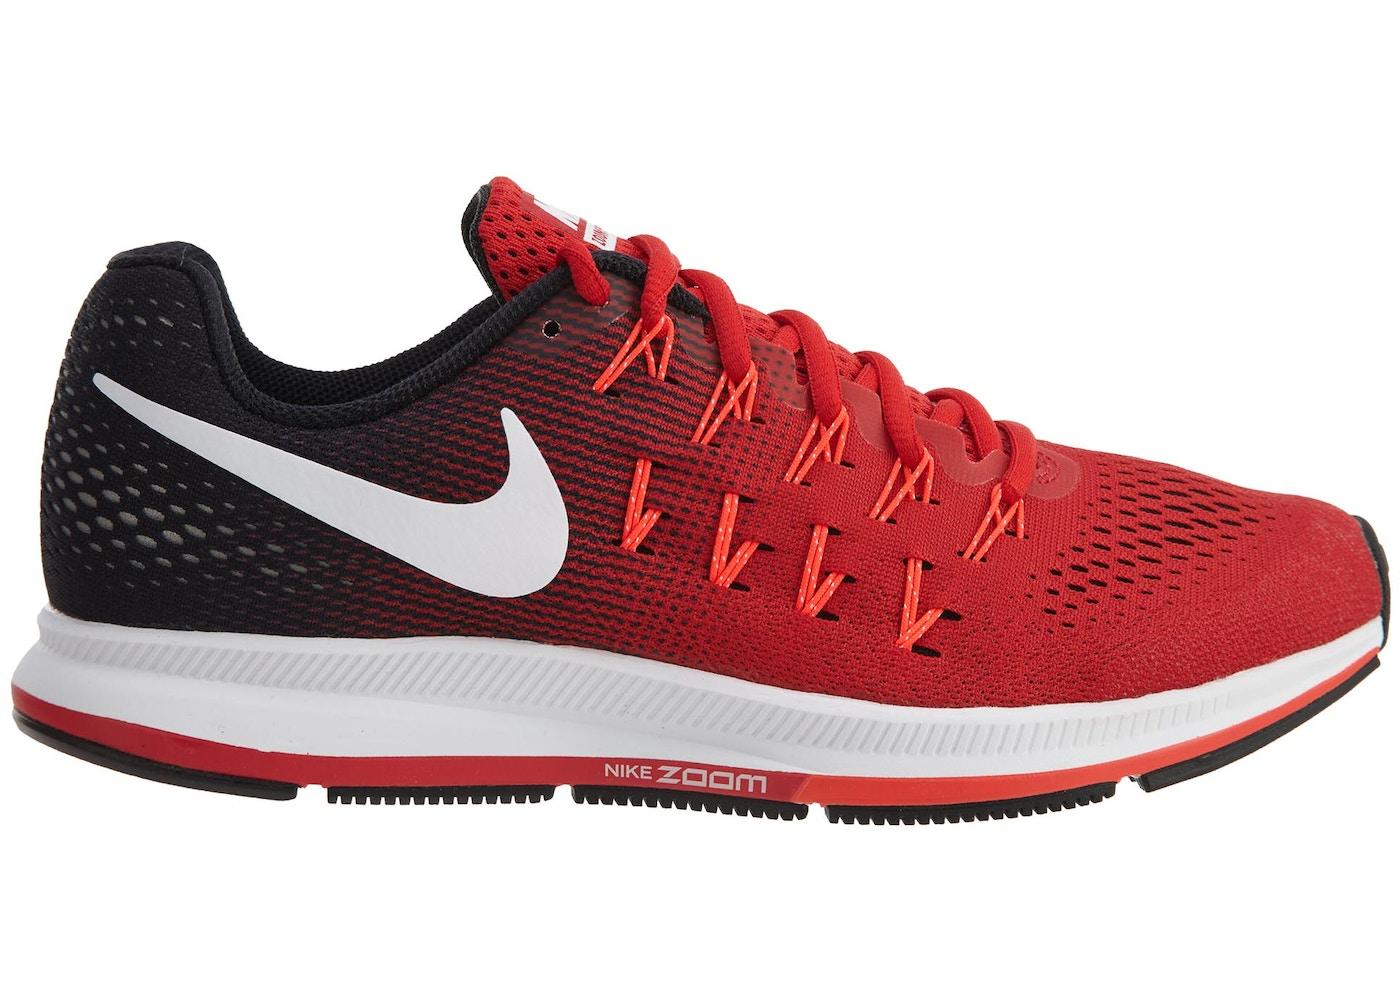 pretty nice 0fbd4 73af8 Nike Air Zoom Pegasus 33 University Red White-Black - 831352-601